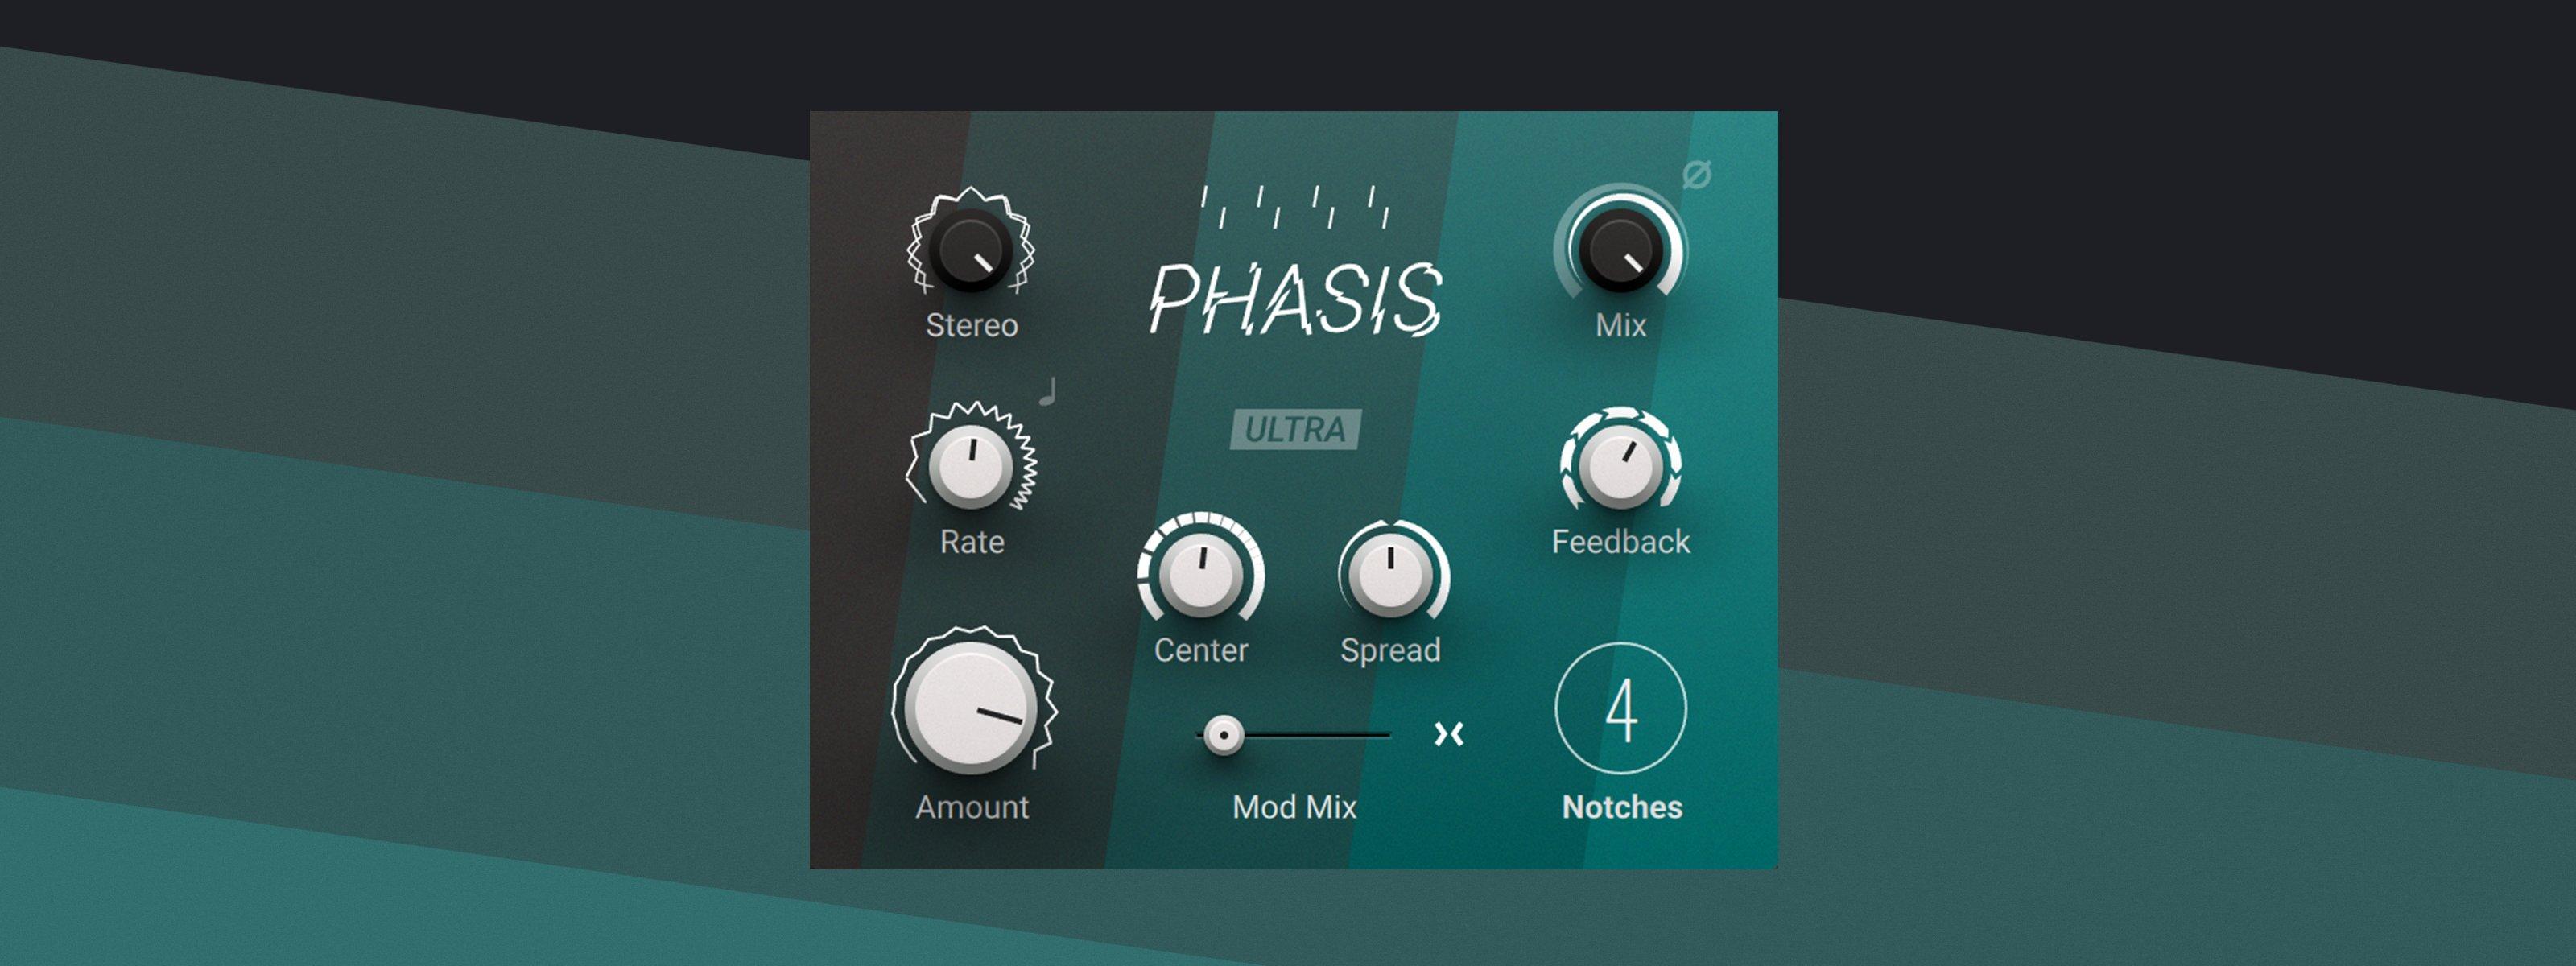 Native Instruments Phasis Mac 破解版 Phaser相位效果器插件-麦氪搜(iMacso.com)